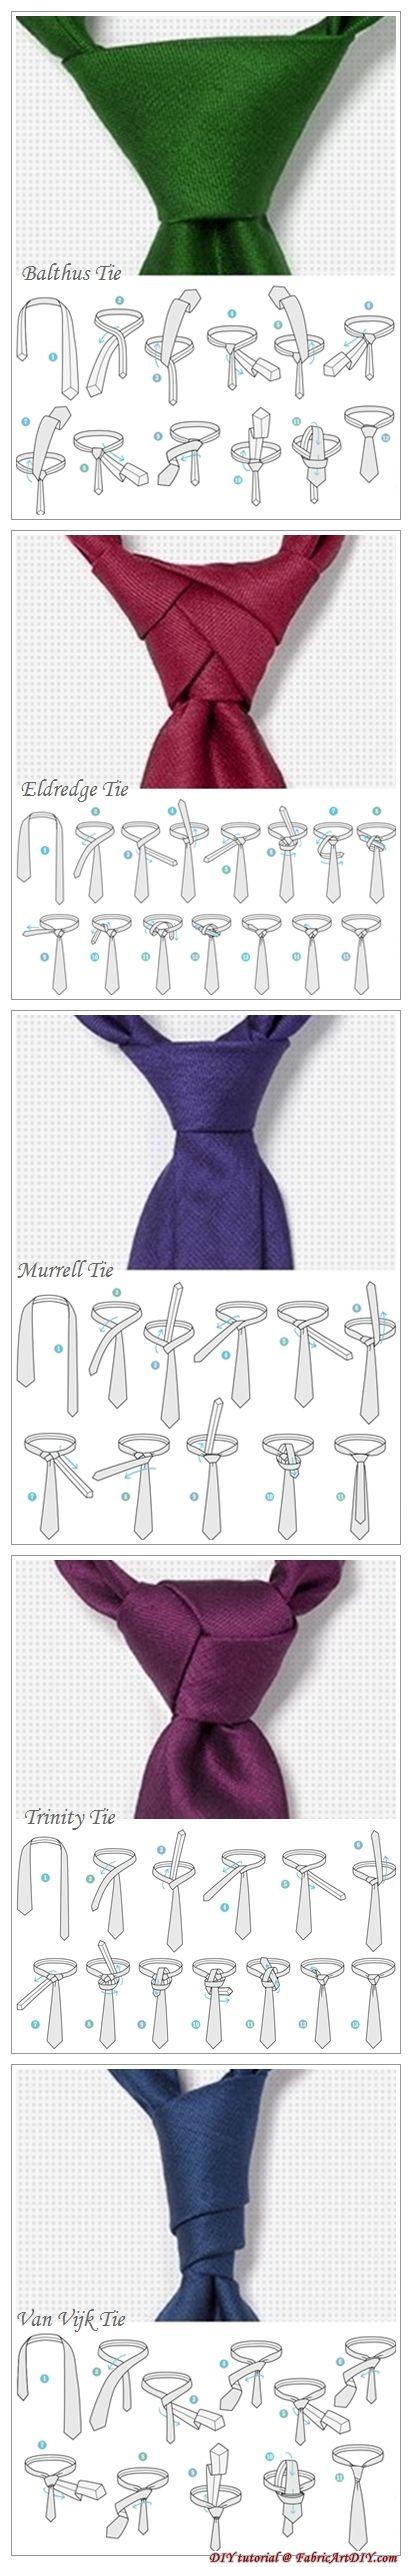 Adventurous tie knot instruction